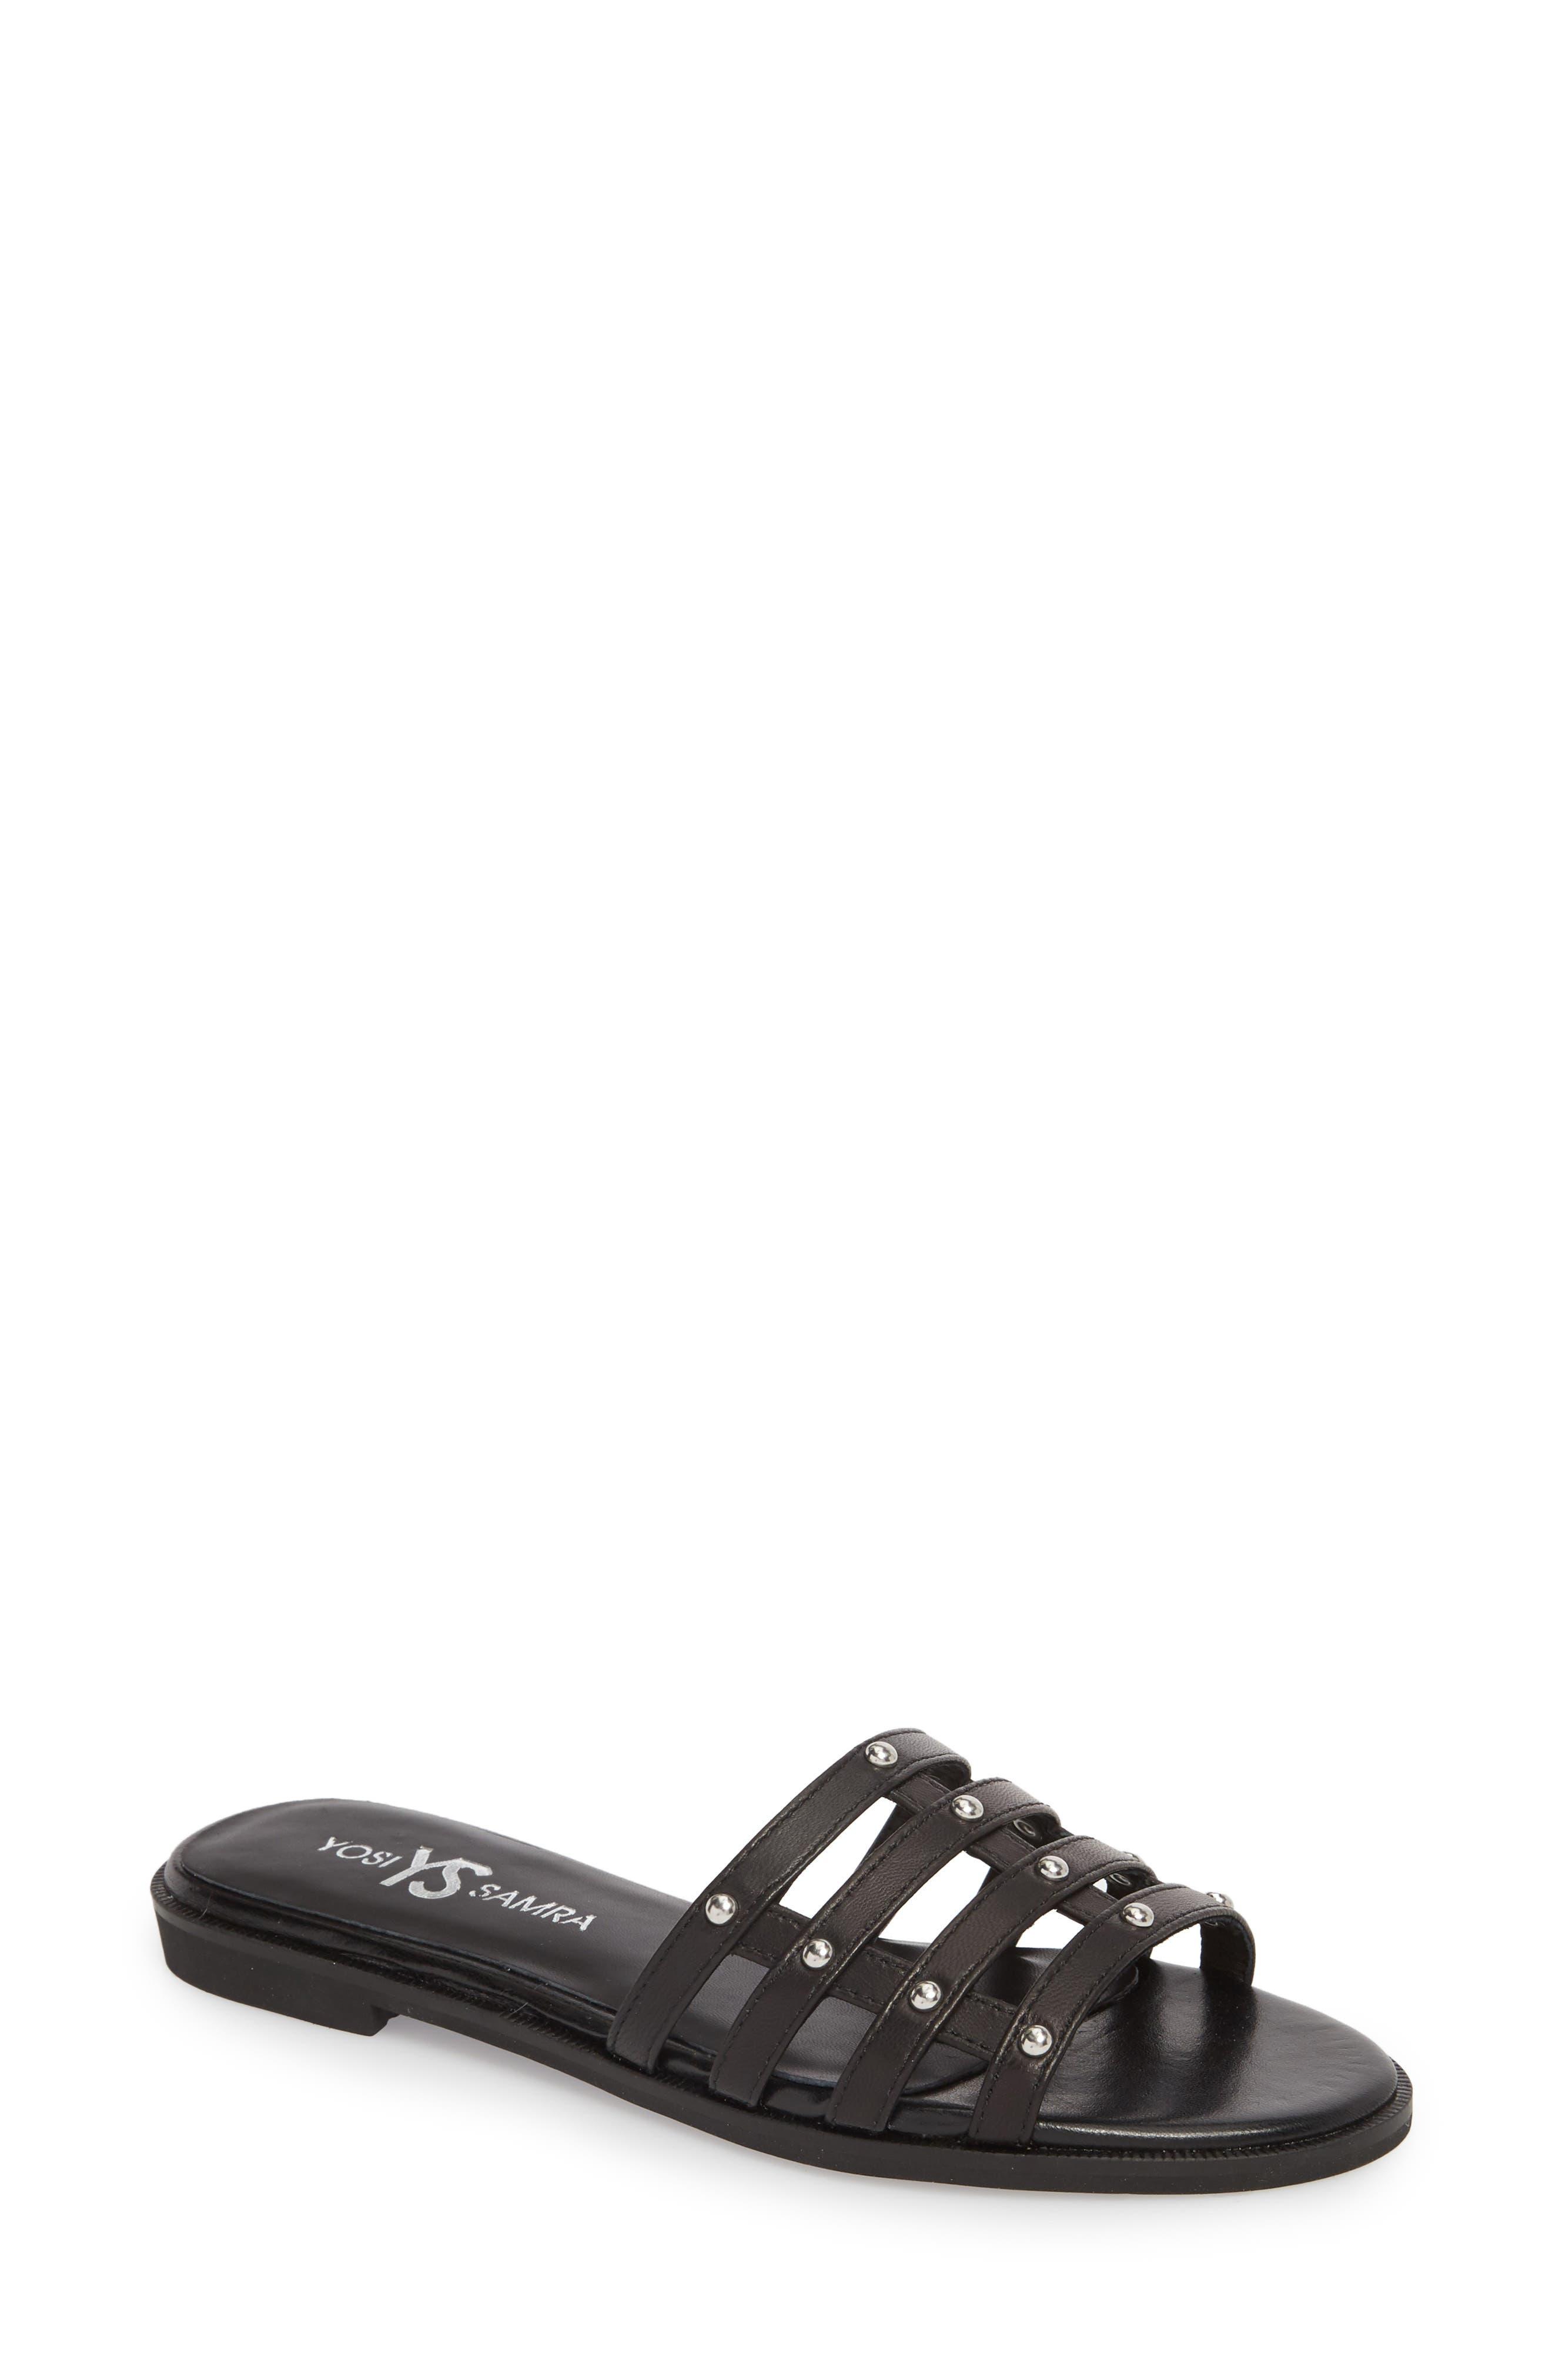 Cara Slide Sandal,                             Main thumbnail 1, color,                             Black/ Silver Studs